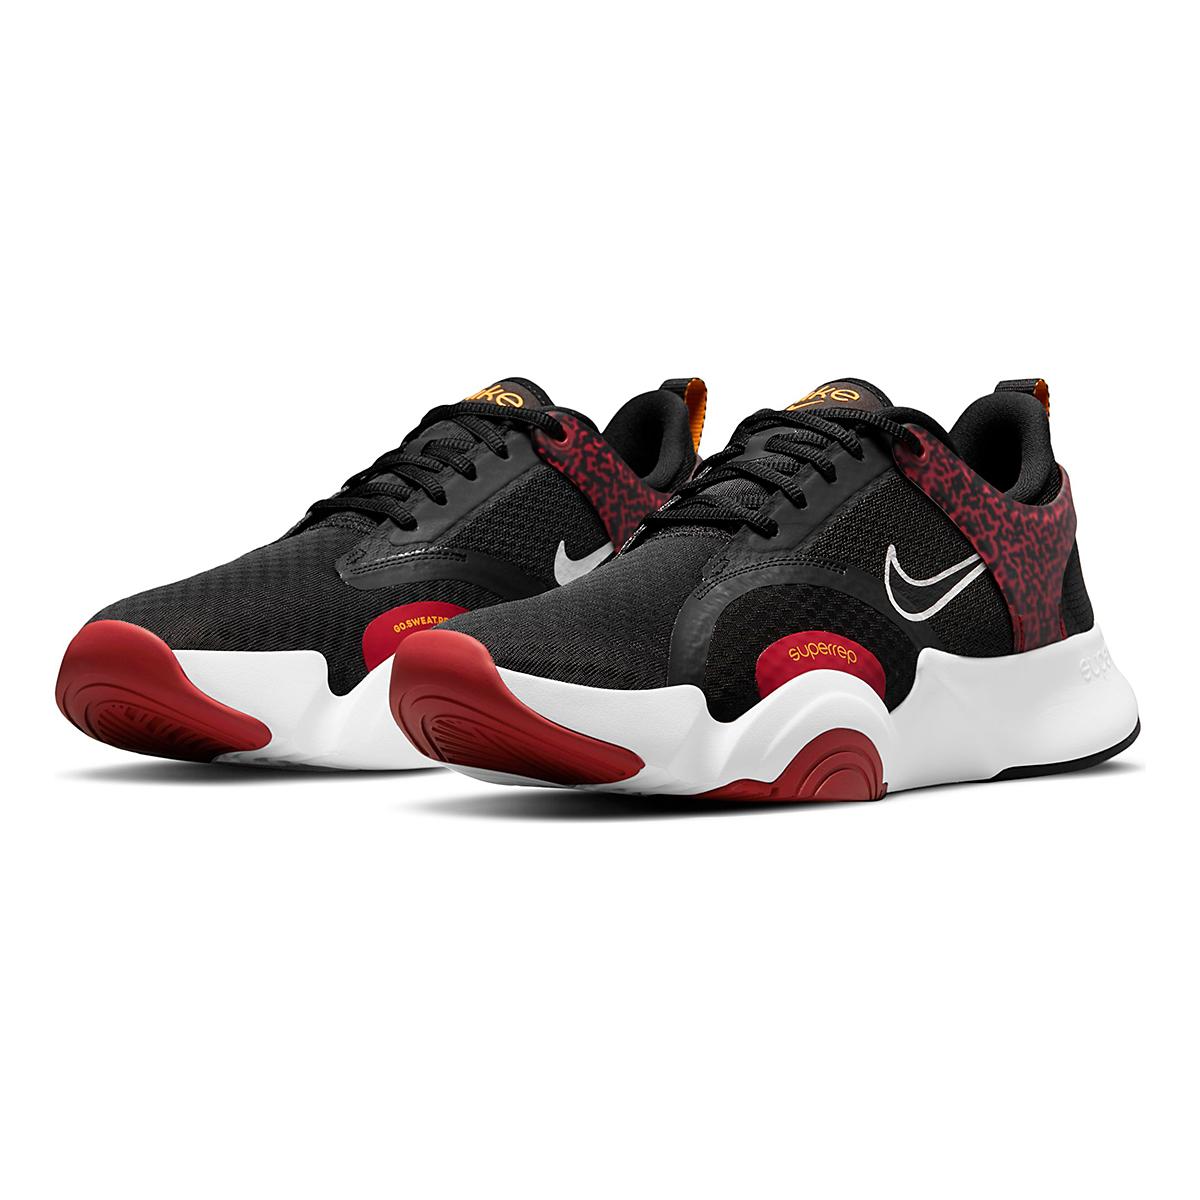 Men's Nike SuperRep Go 2 Training Shoe - Color: Black/White/Dark Cayenne/Solar Flare - Size: 6 - Width: Regular, Black/White/Dark Cayenne/Solar Flare, large, image 3